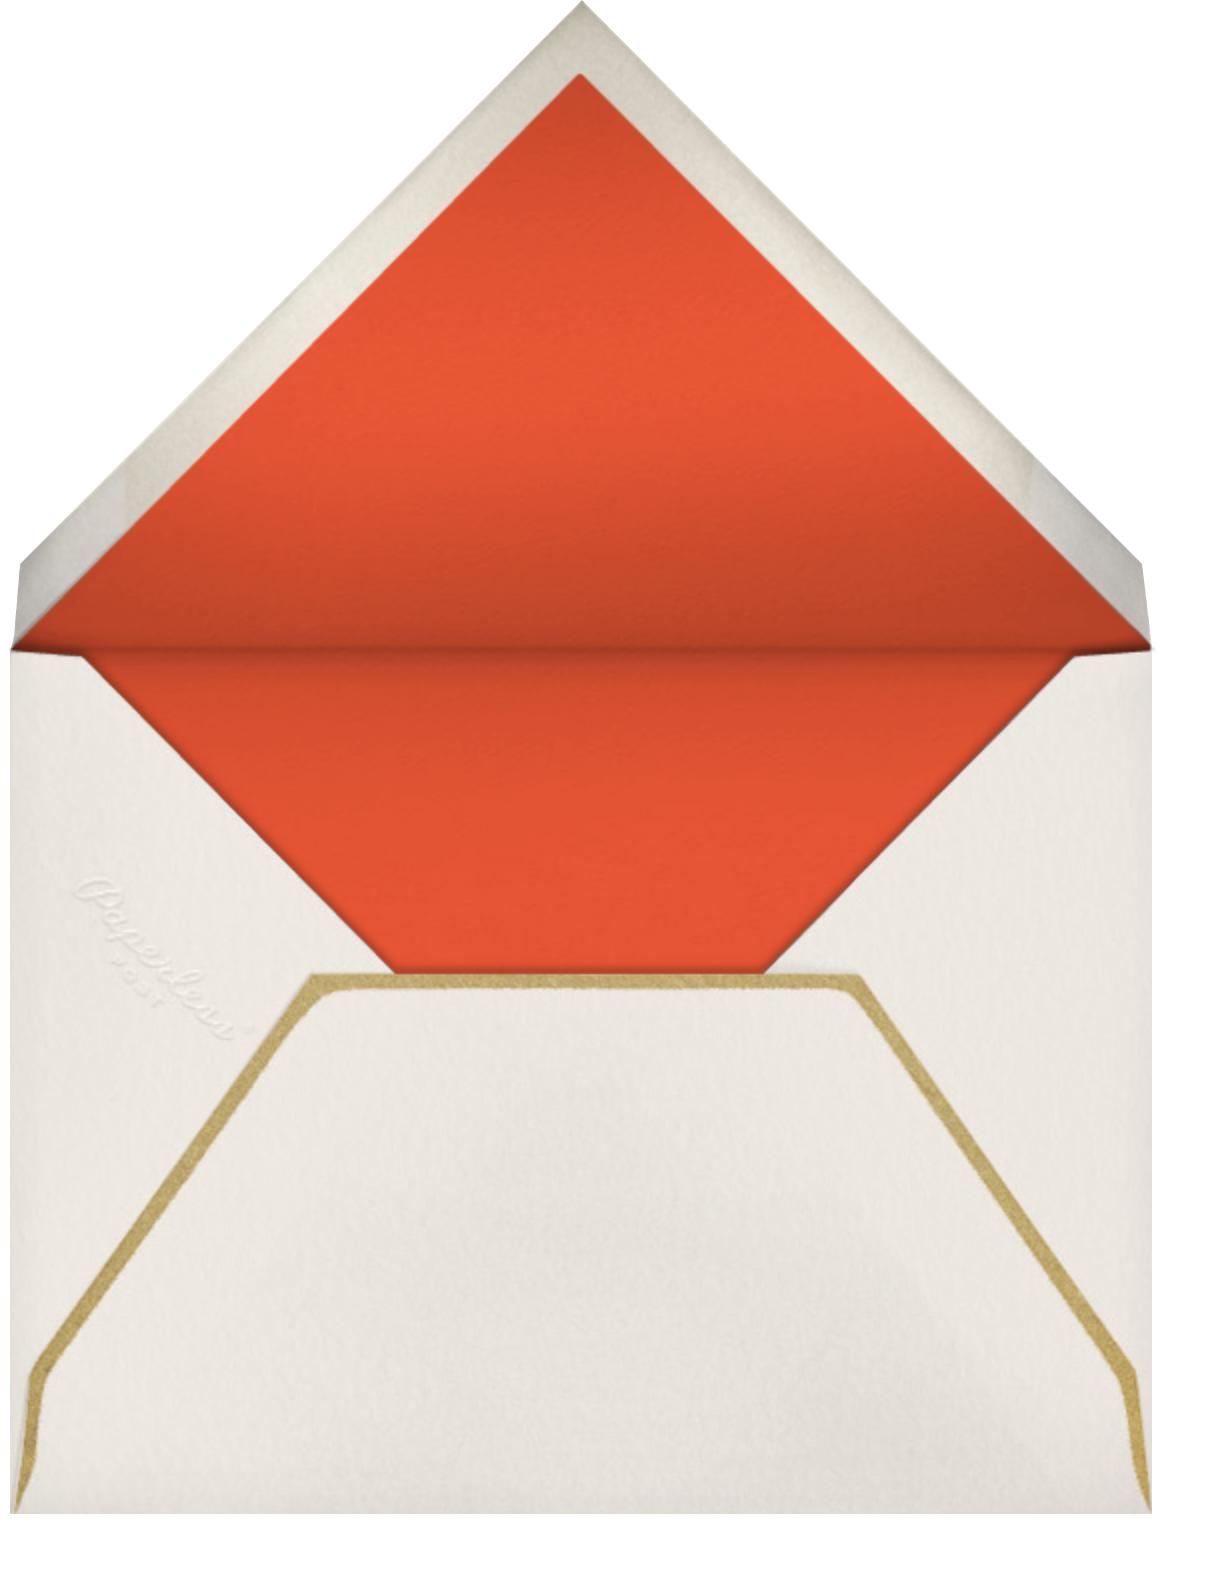 Curlicue Tree - kate spade new york - Christmas - envelope back